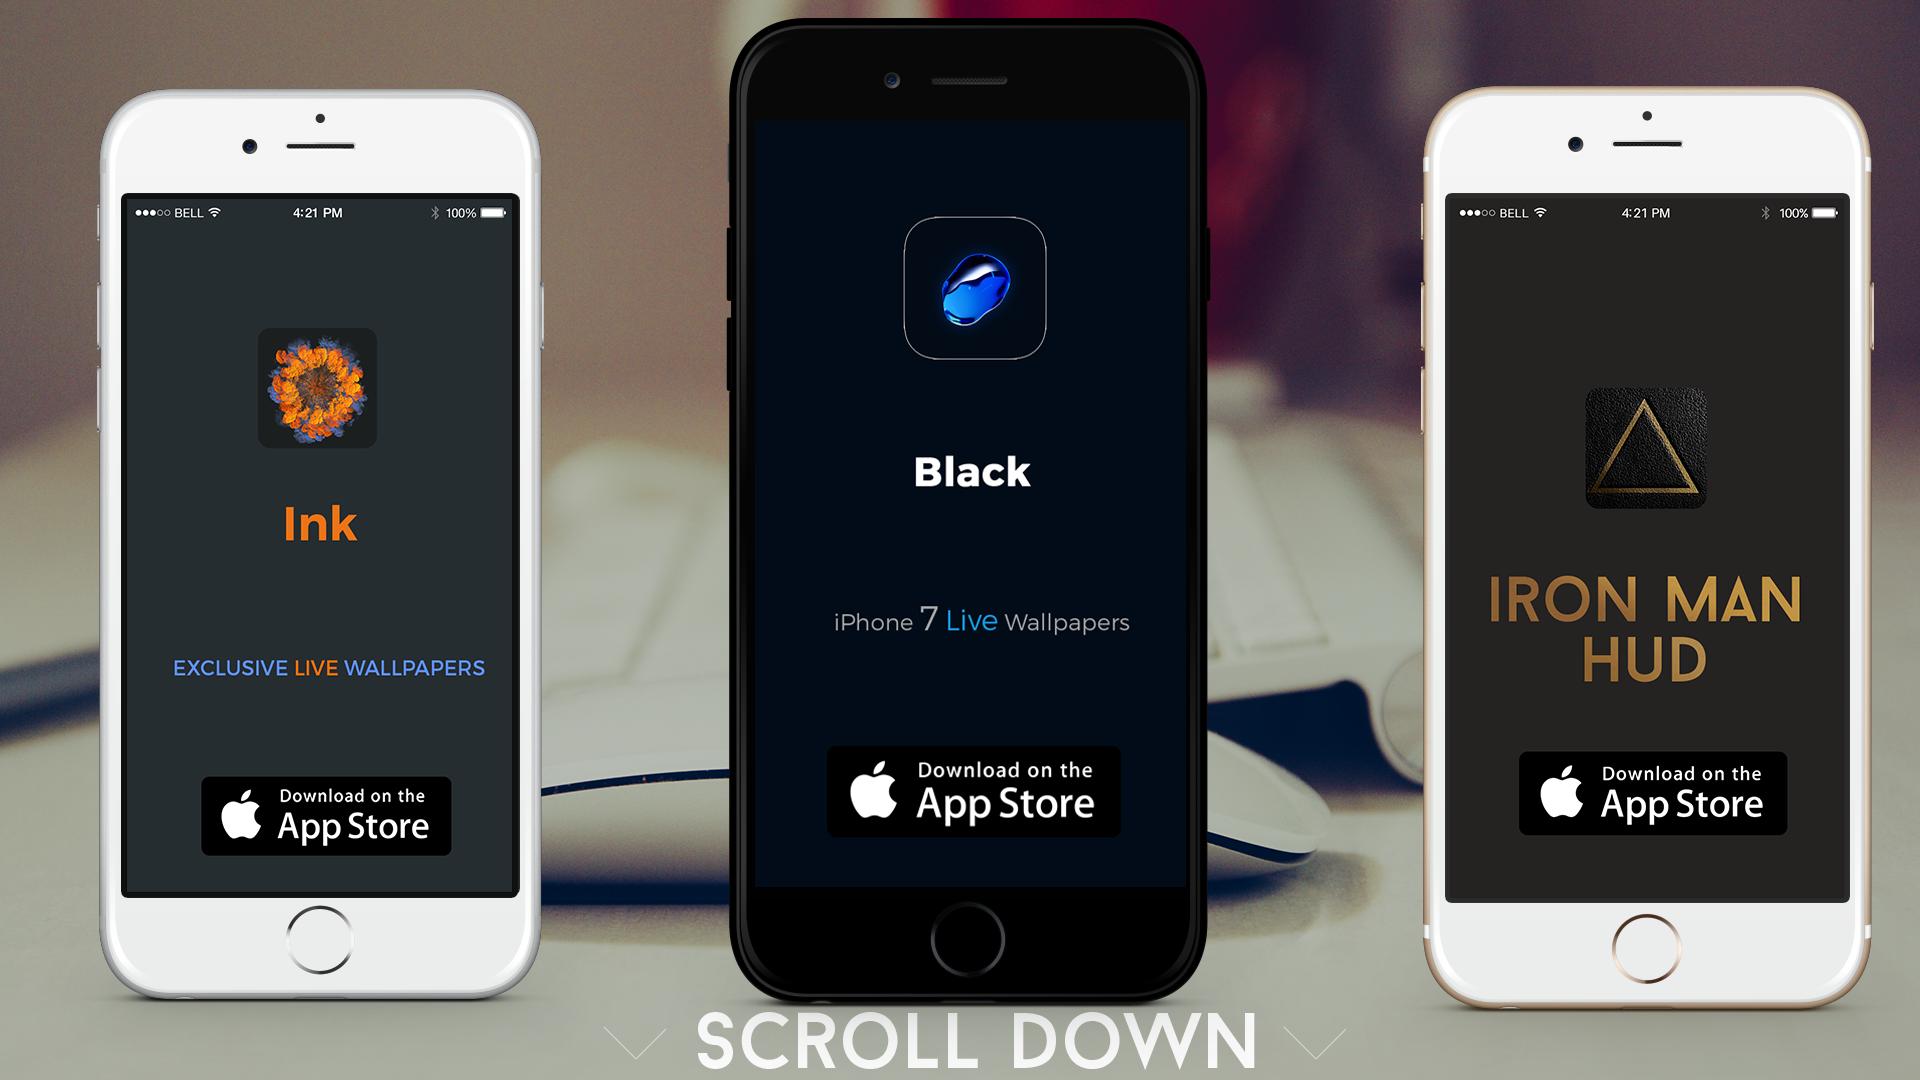 Wallpaper download app for iphone - Wallpaper Download App For Iphone 28